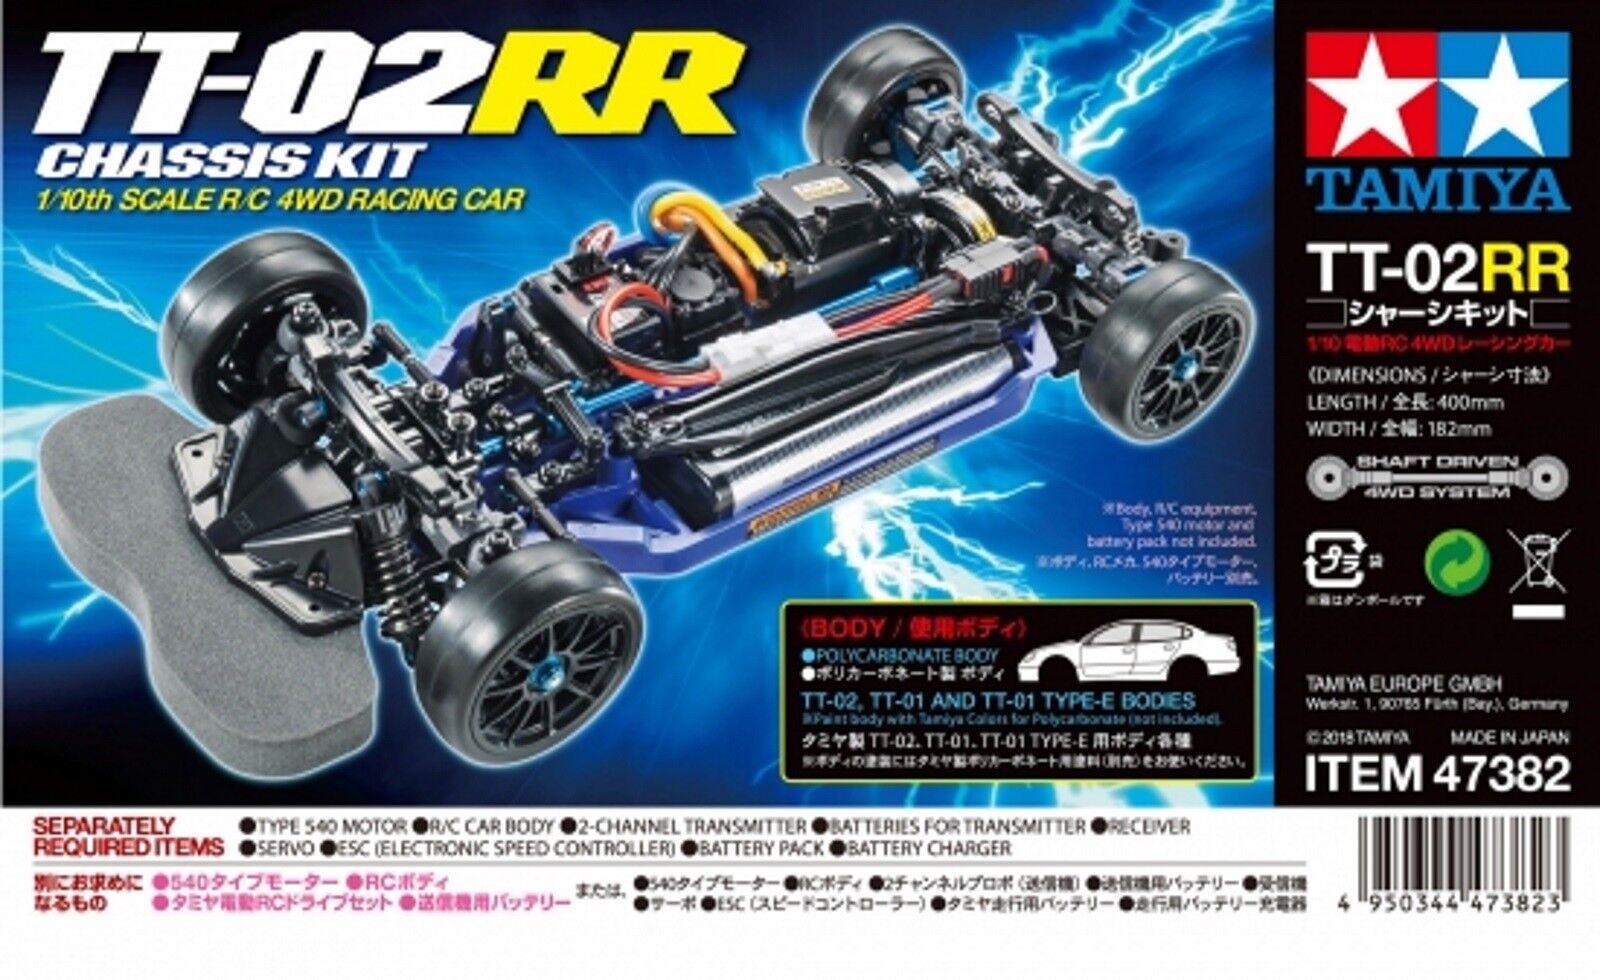 Tamiya 1 10 Rc TT-02RR Chassis Set Tuning- Kit, New Version 47382